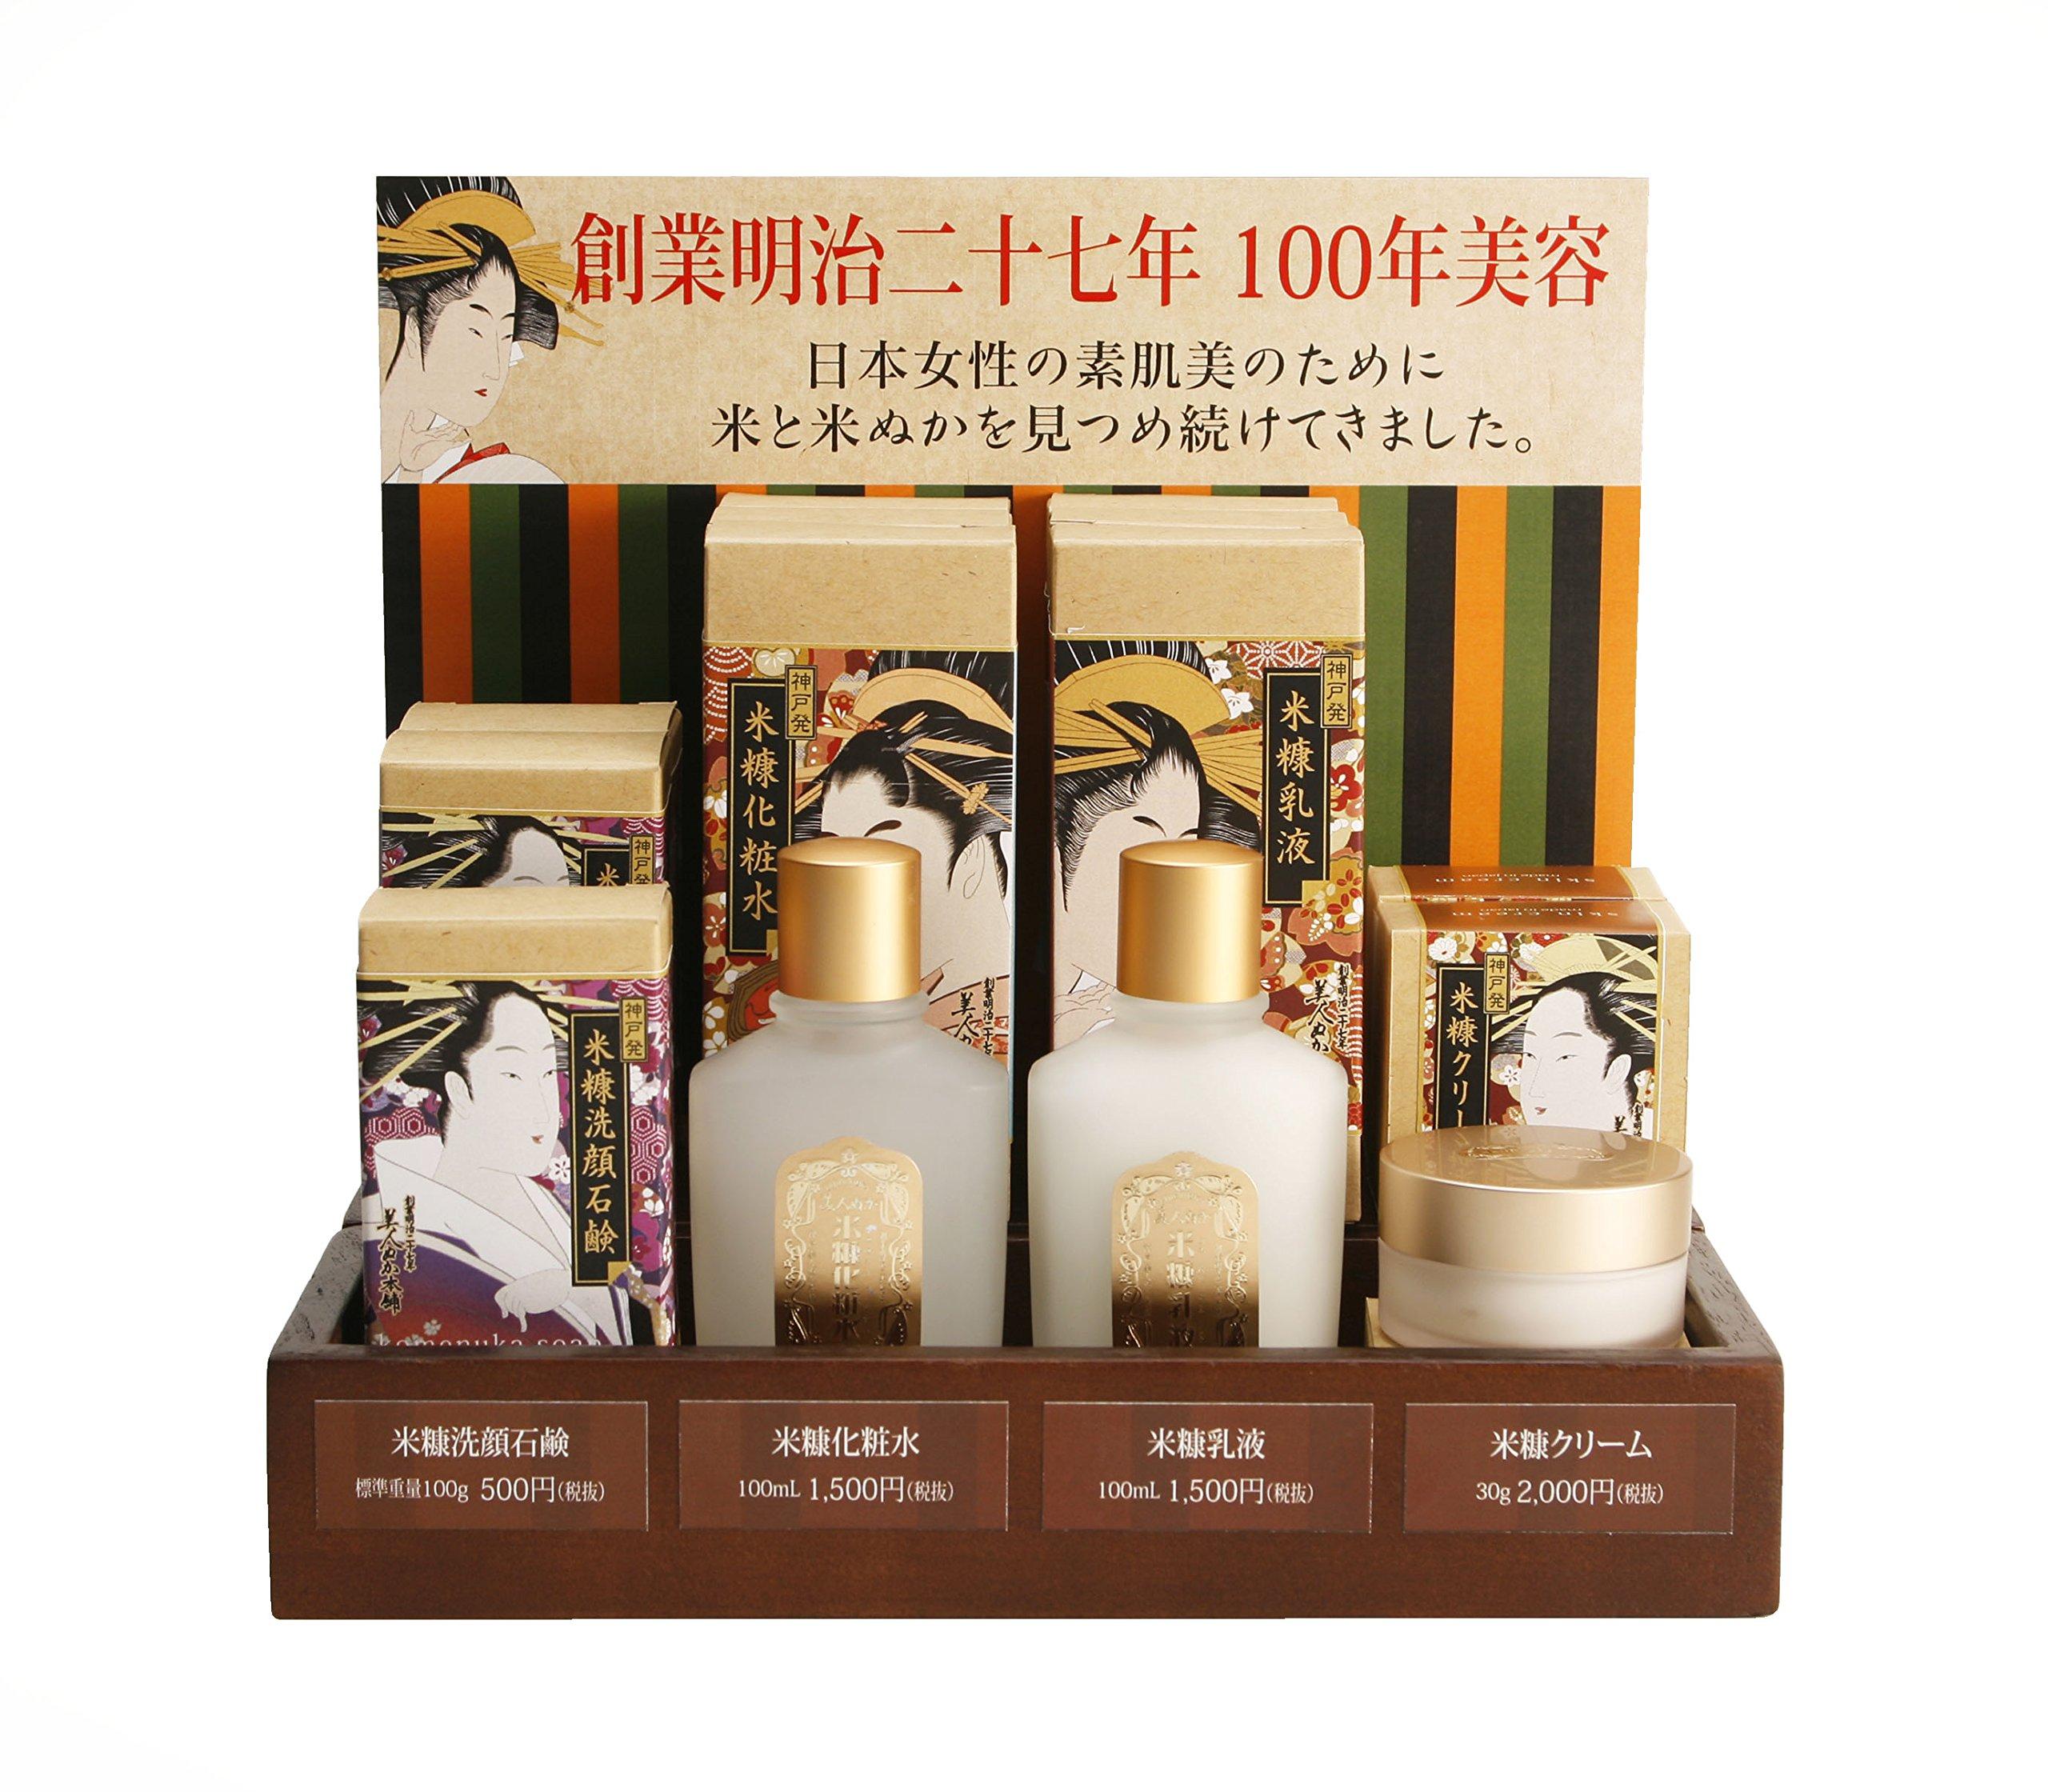 100 Year komenuka bijin Rice Bran Extra Moisture Lotion 100ml (ukiyoe Package)